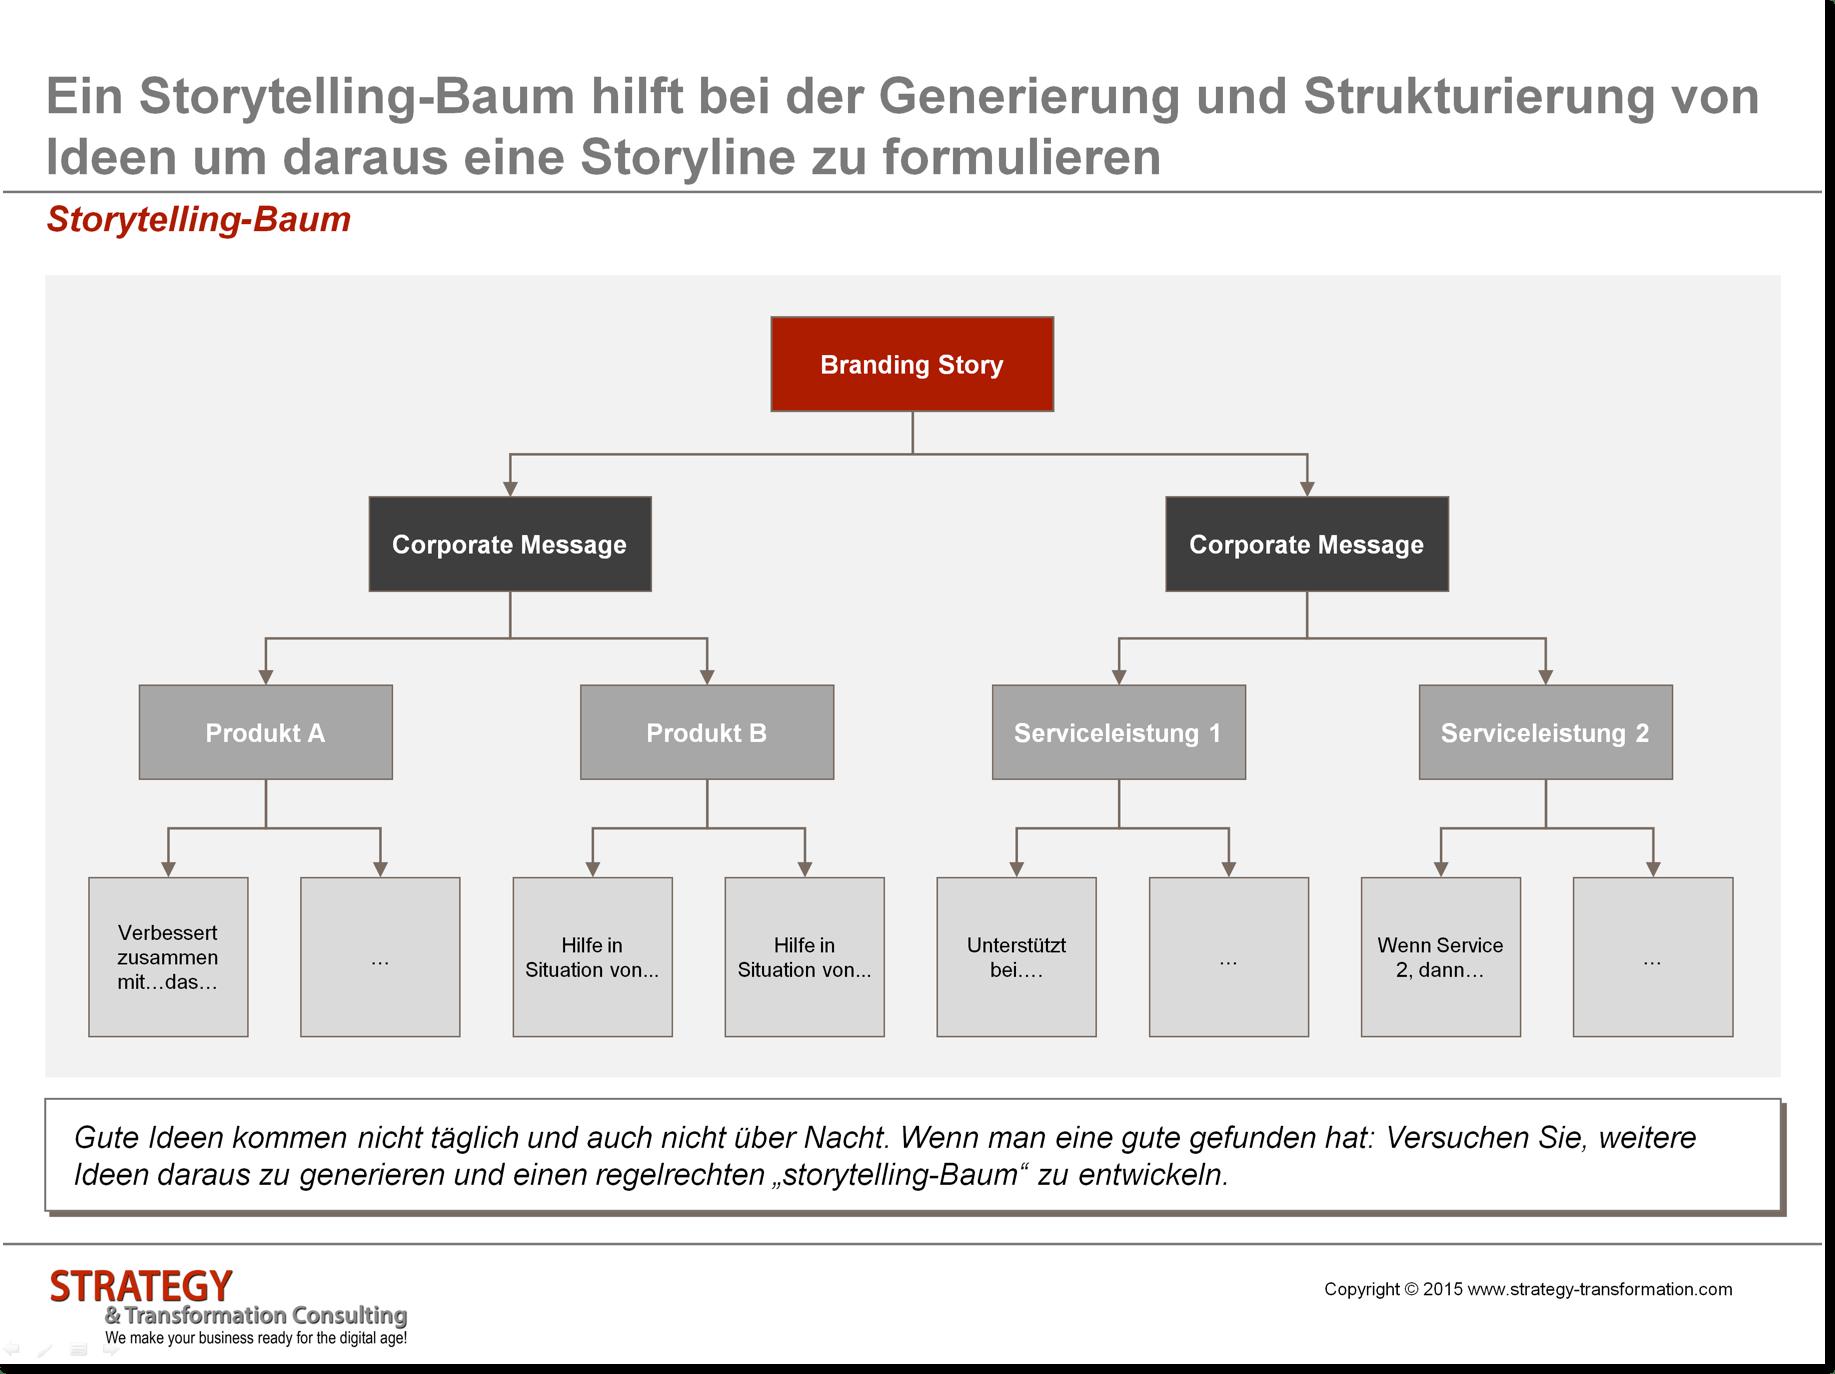 01 Storytelling-Baum